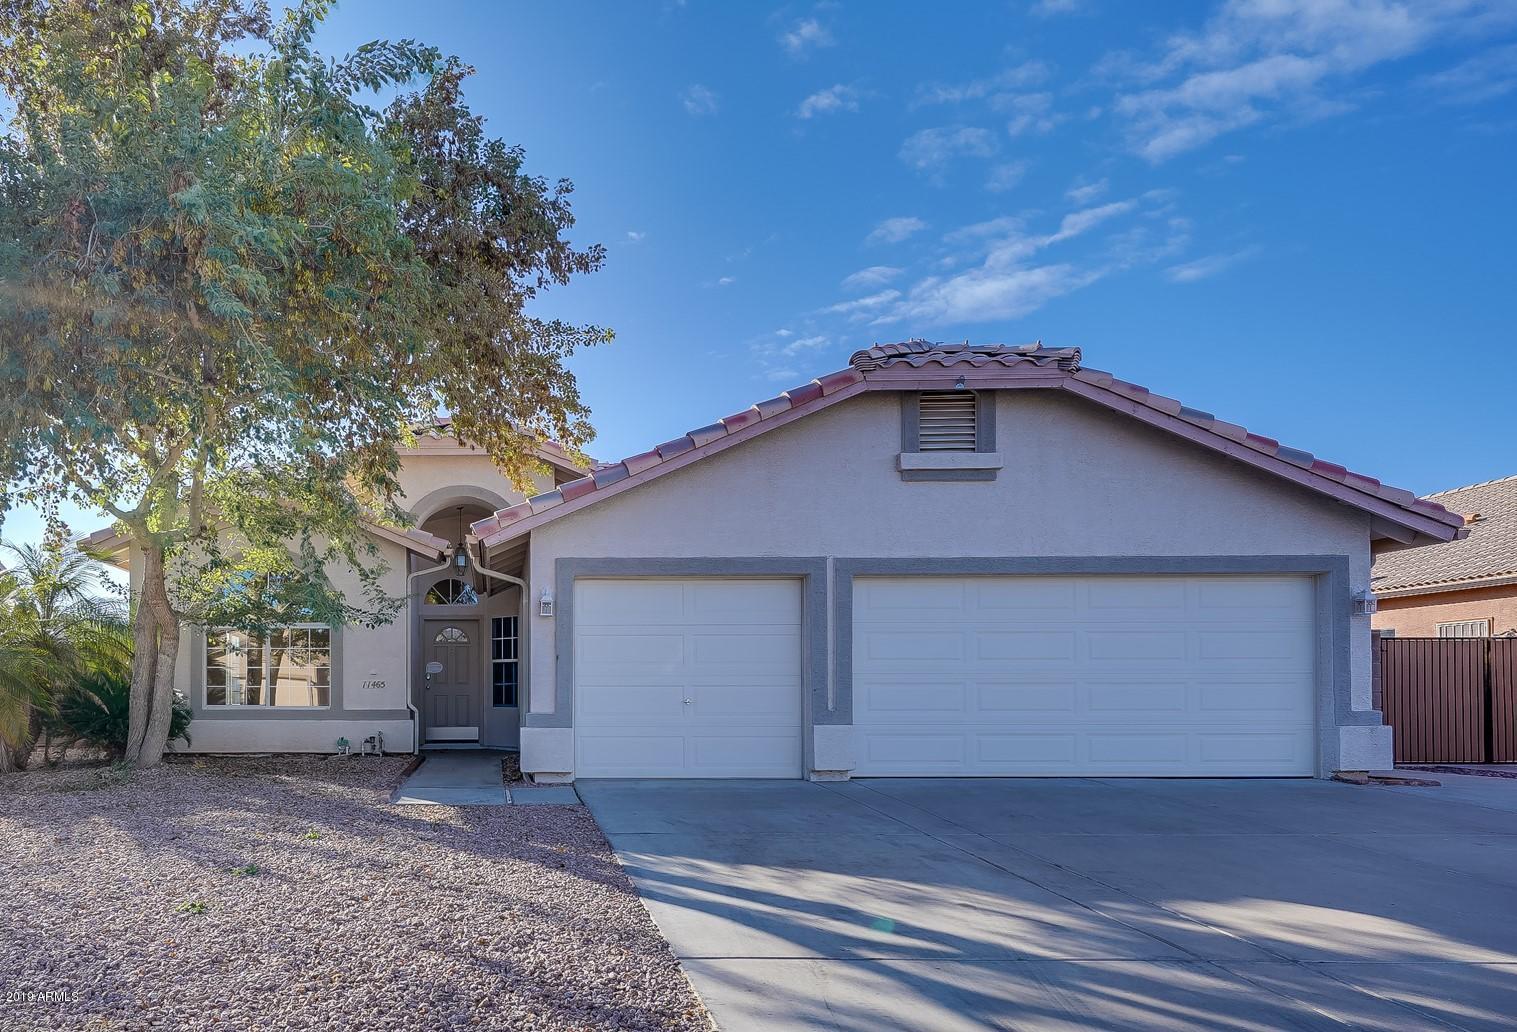 Photo of 11465 E DECATUR Street, Mesa, AZ 85207